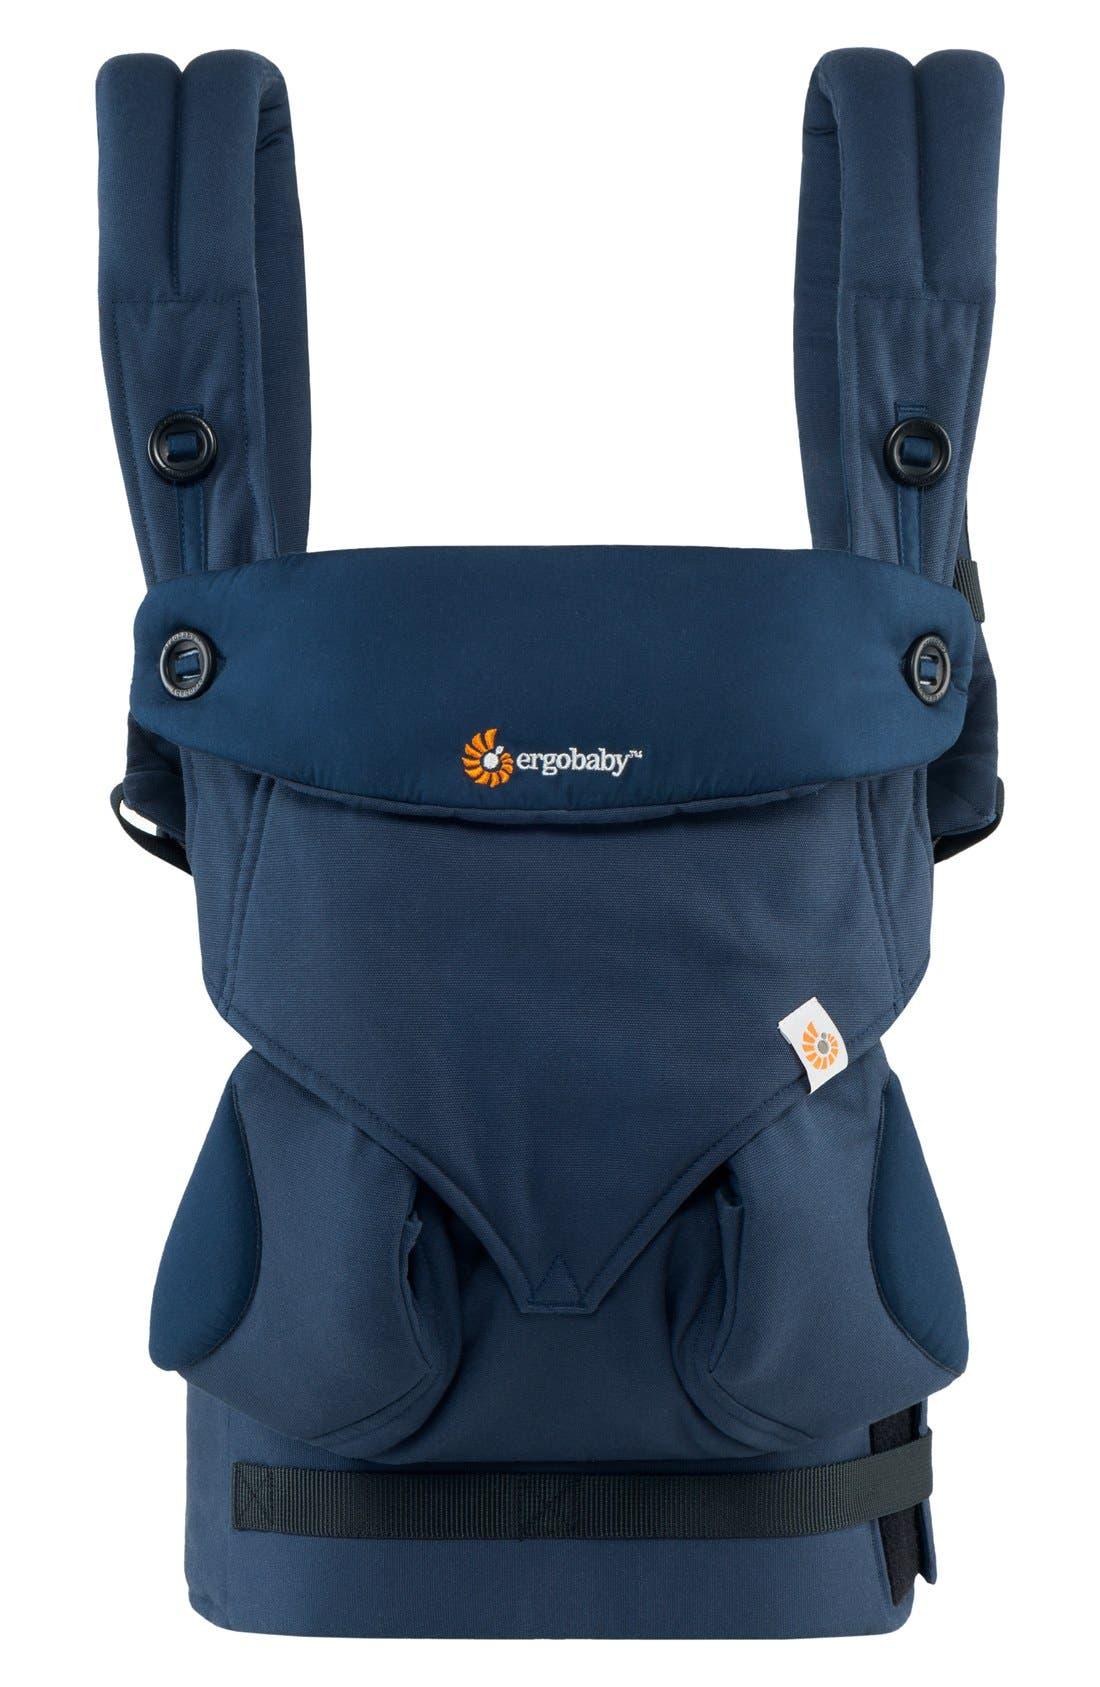 ERGOBABY '360' Baby Carrier